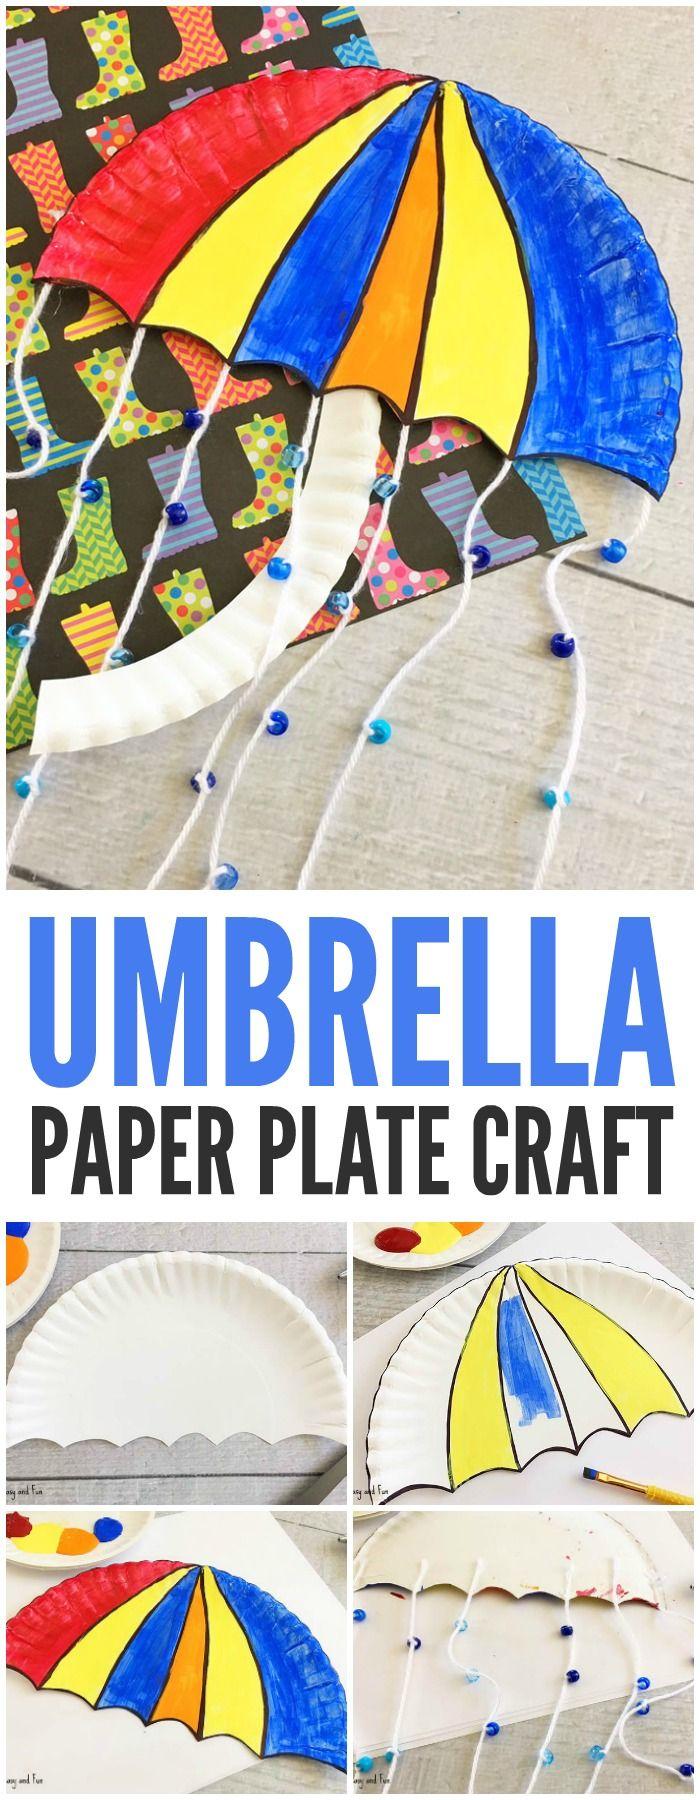 Umbrella Paper Plate Craft - Weather Crafts for Kids #cuteumbrellas